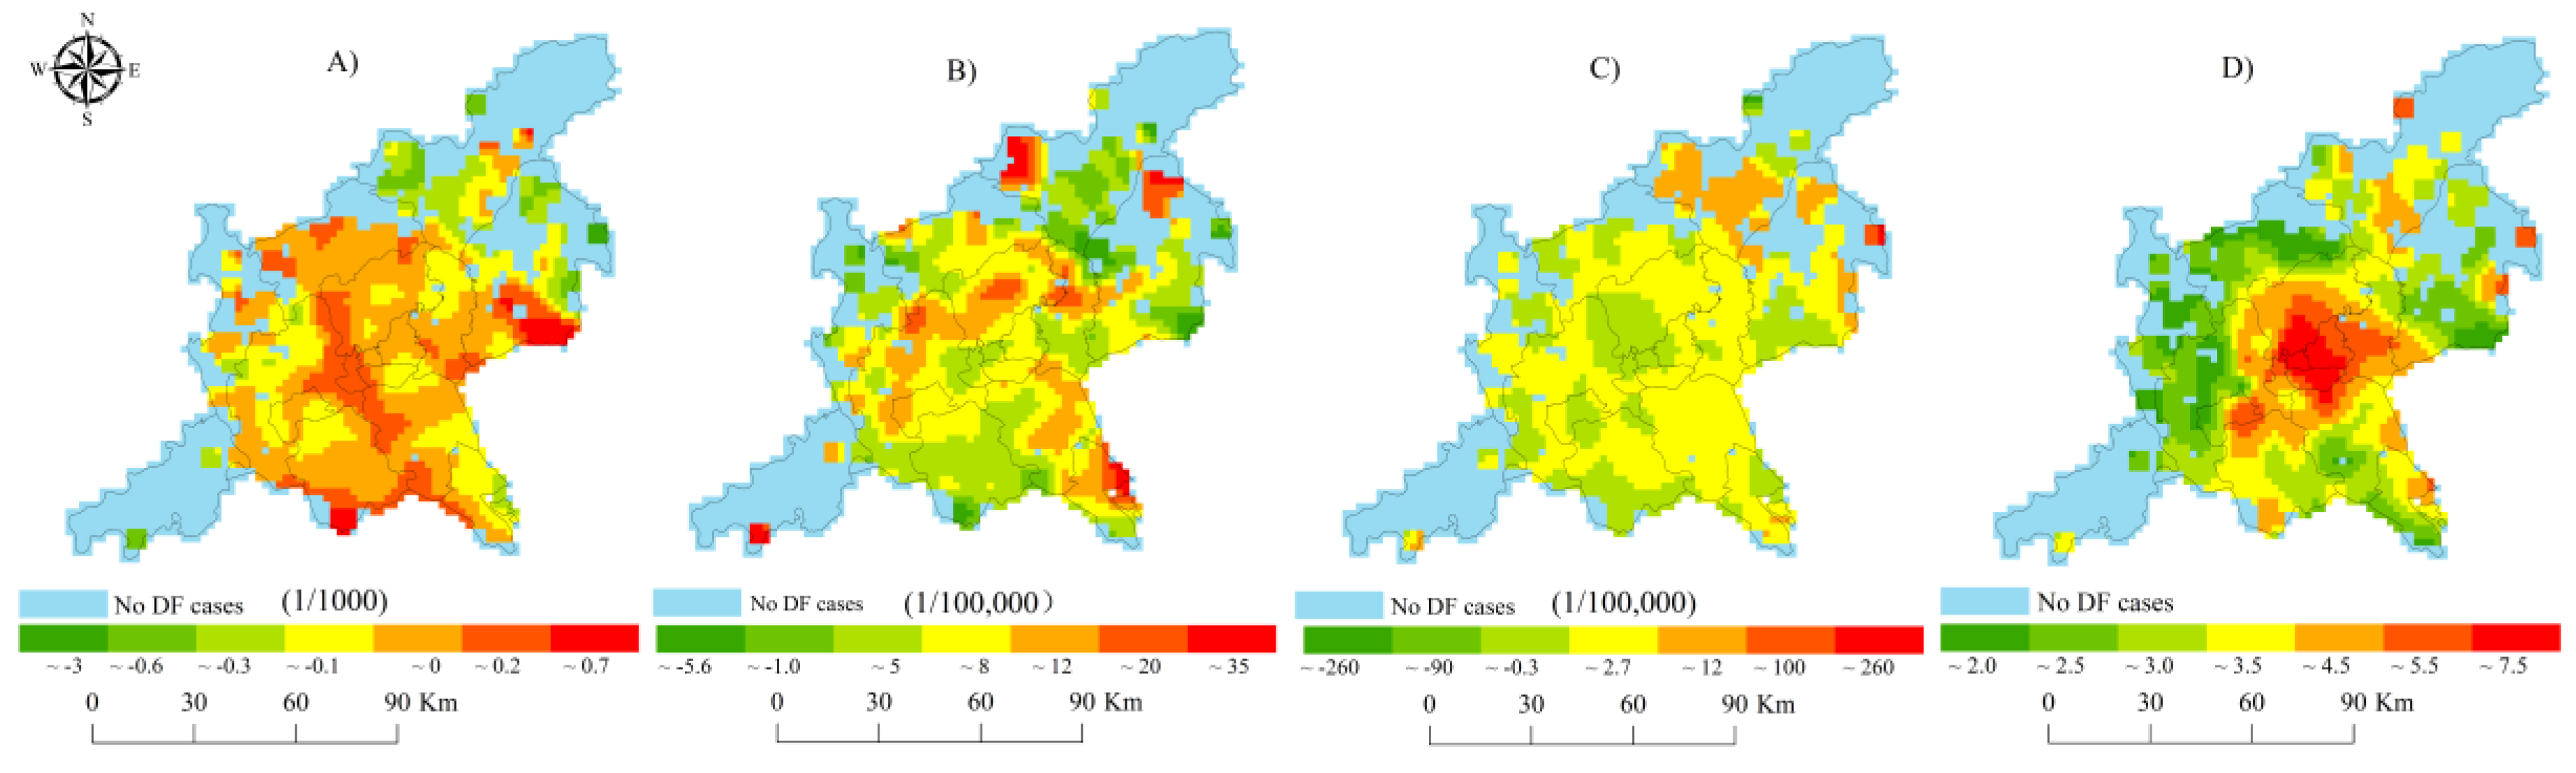 IJERPH | Free Full-Text | Exploring Determinants of Spatial